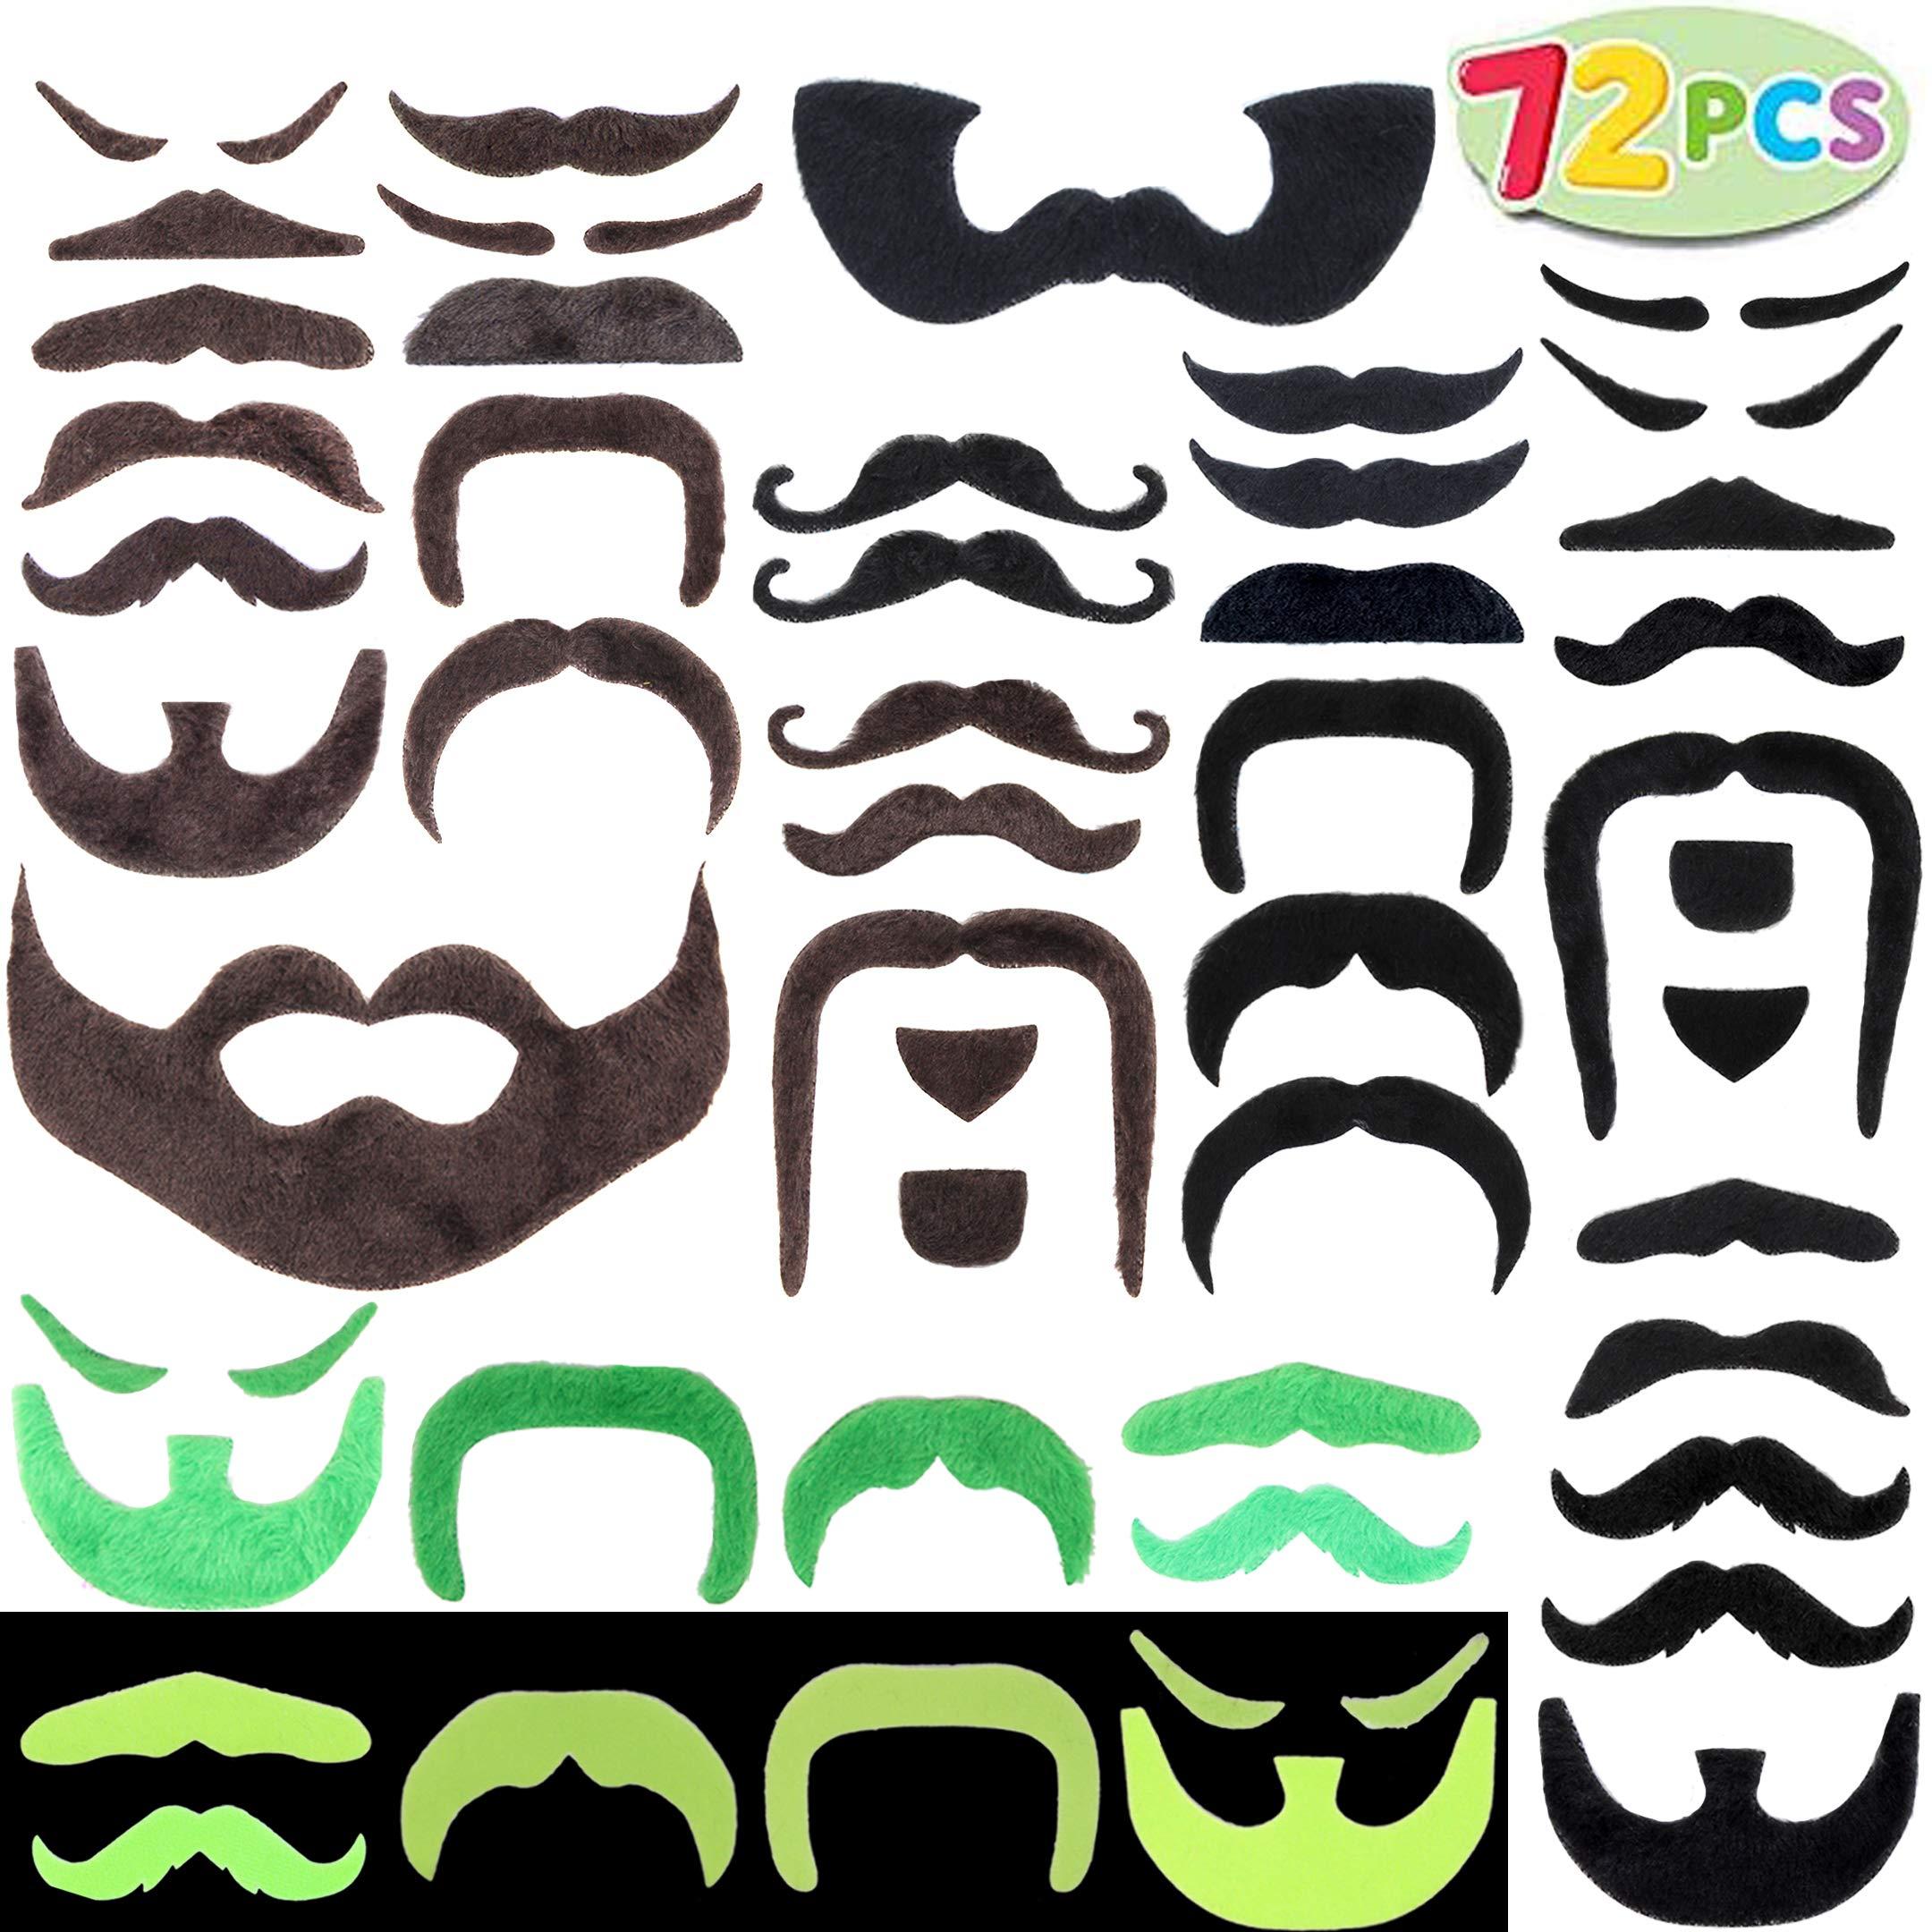 JOYIN 72 Fake Mustache Beard Self Adhesive Novelty St Patricks Costume Accessories, Sombrero Favor Supply Decoration